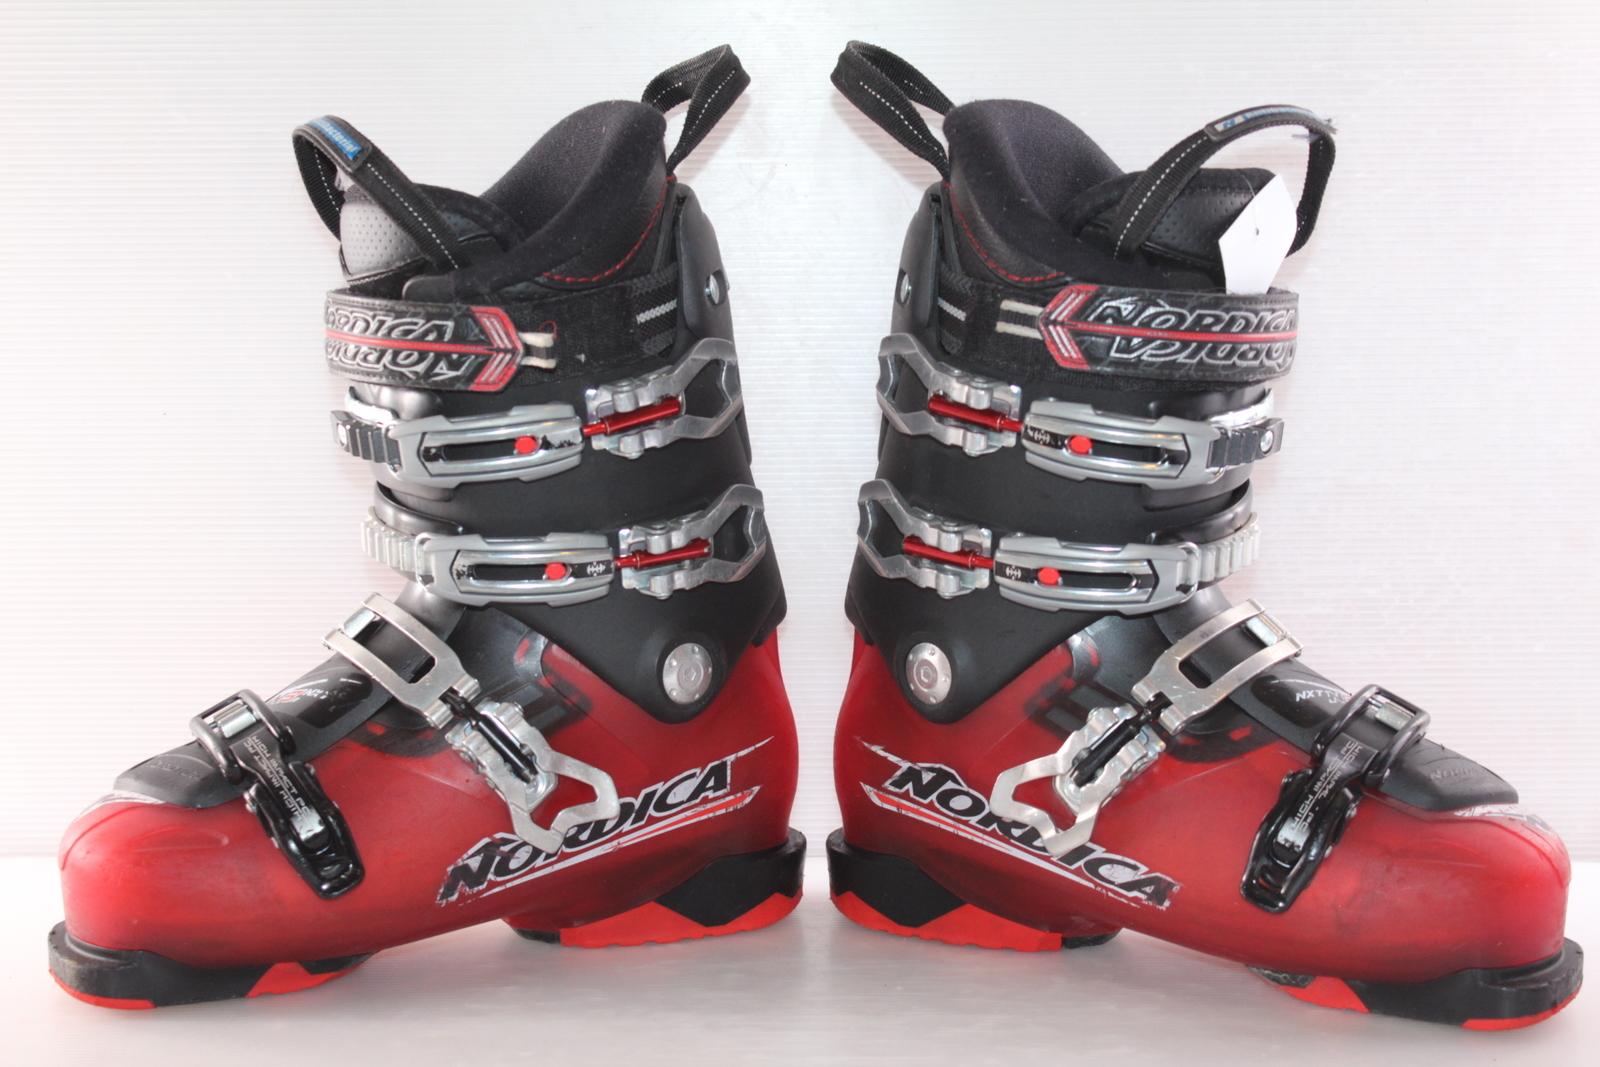 Lyžařské boty Nordica NXT N3R vel. EU40